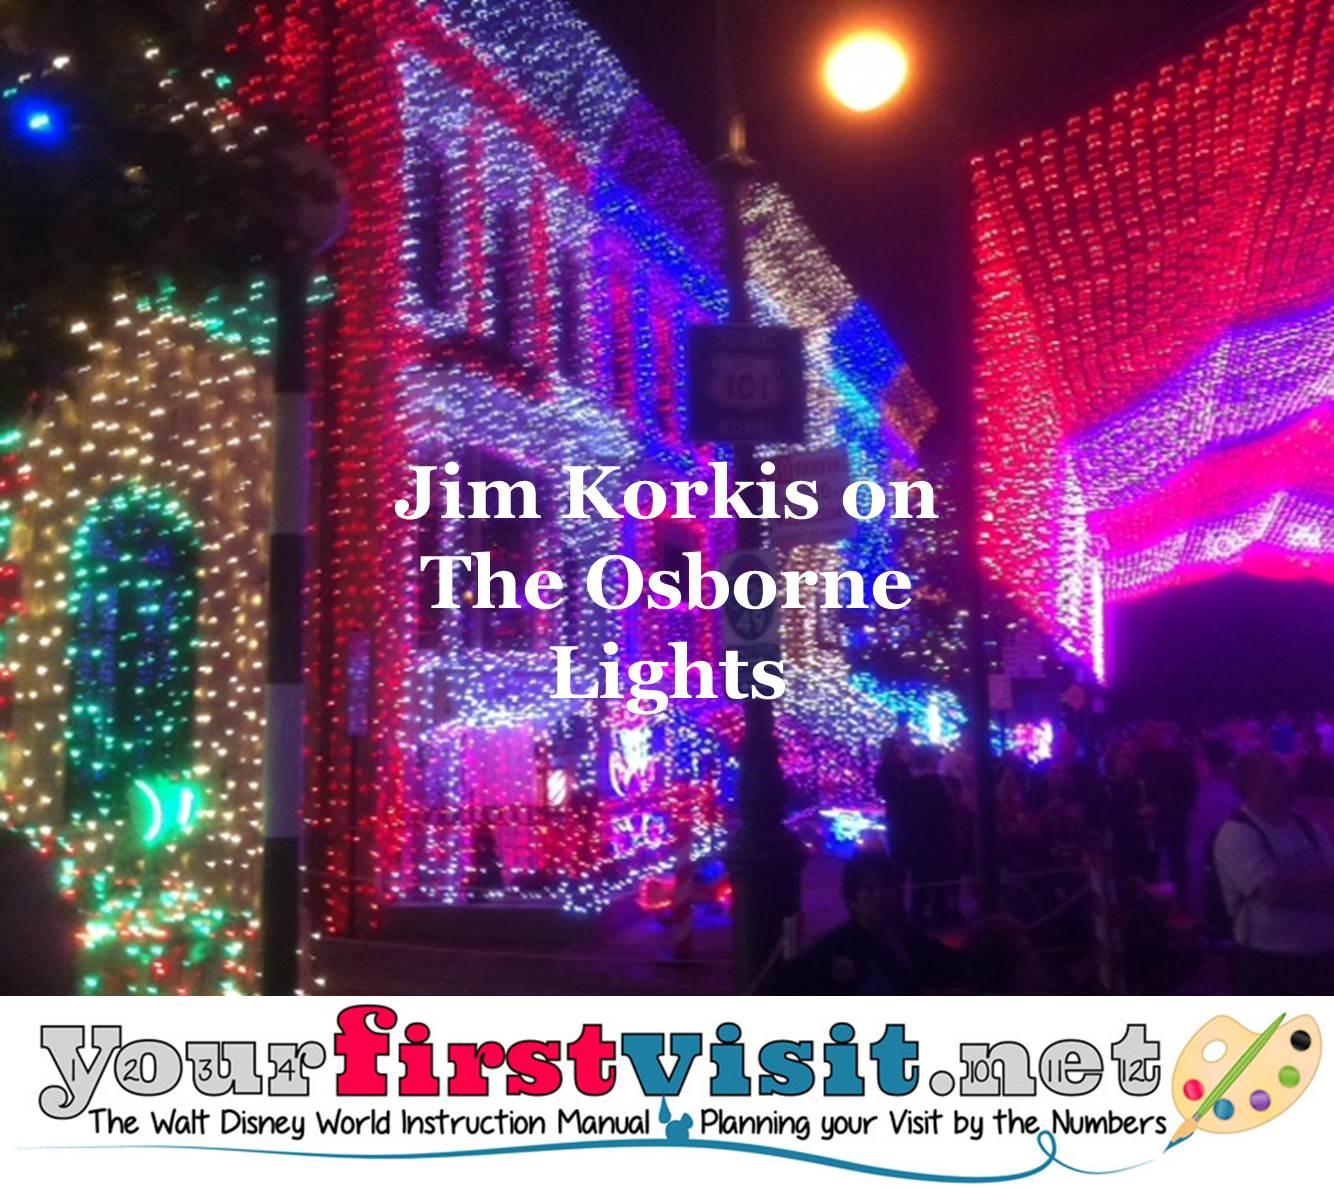 Jim Korkis on The Osborne Lights from yourfirstvisit.net